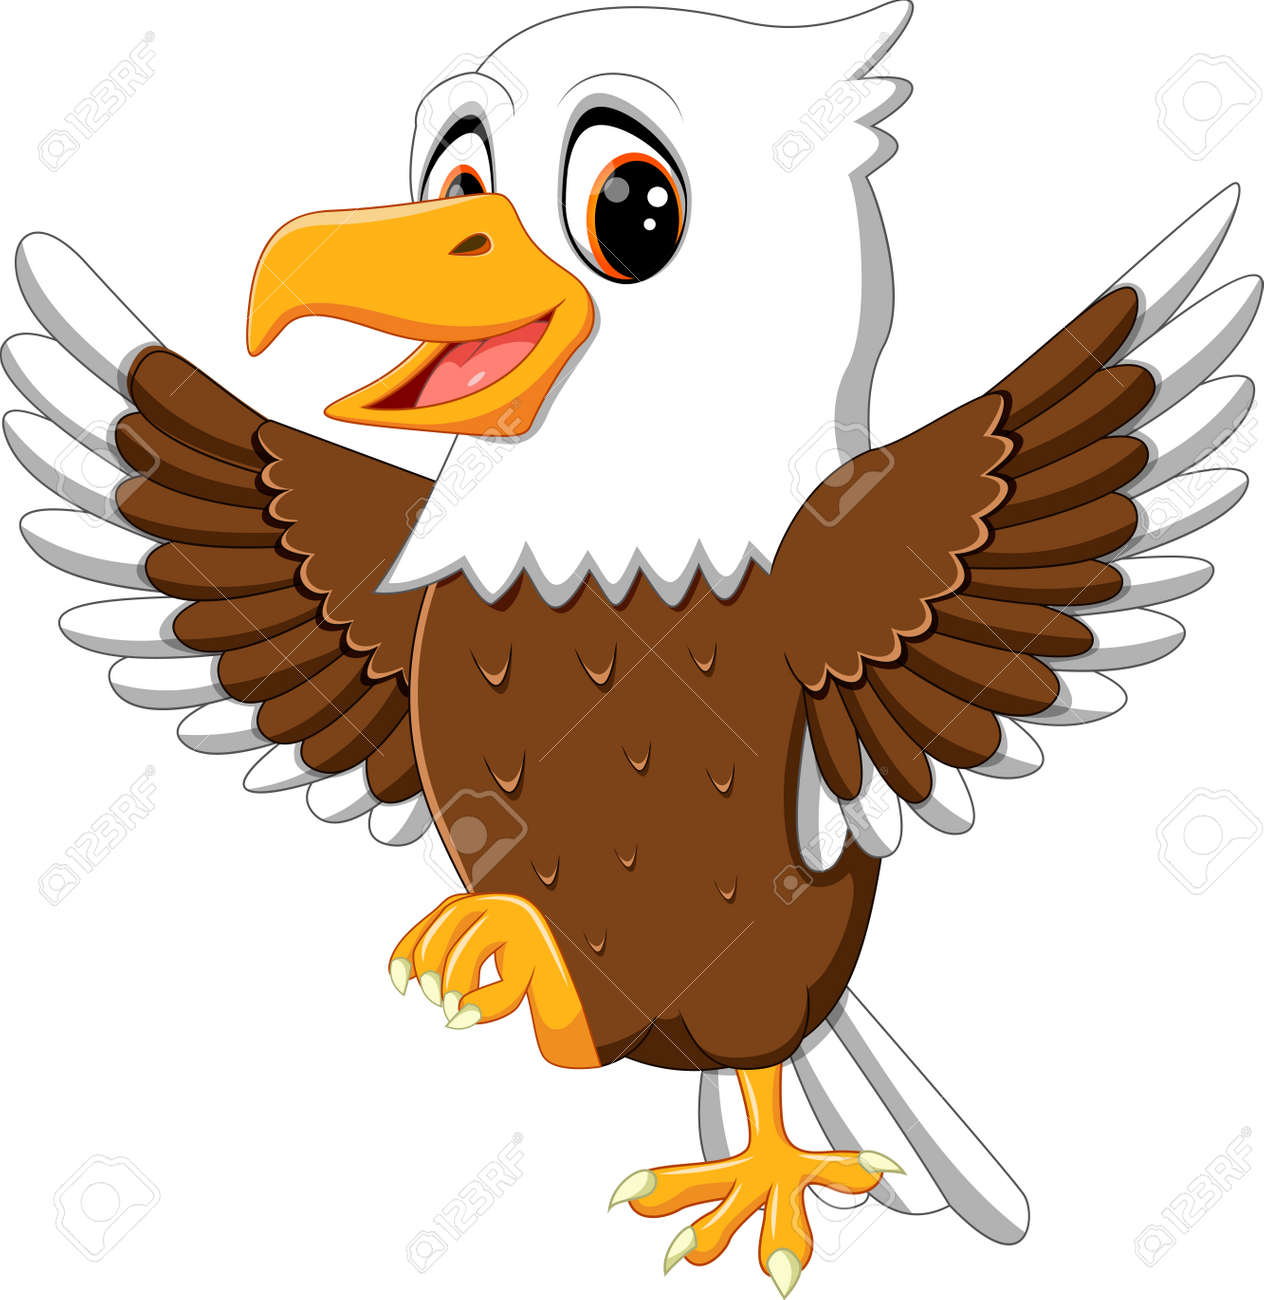 cute eagle cartoon stock photo picture and royalty free image rh 123rf com american eagle cartoon images american eagle cartoon images